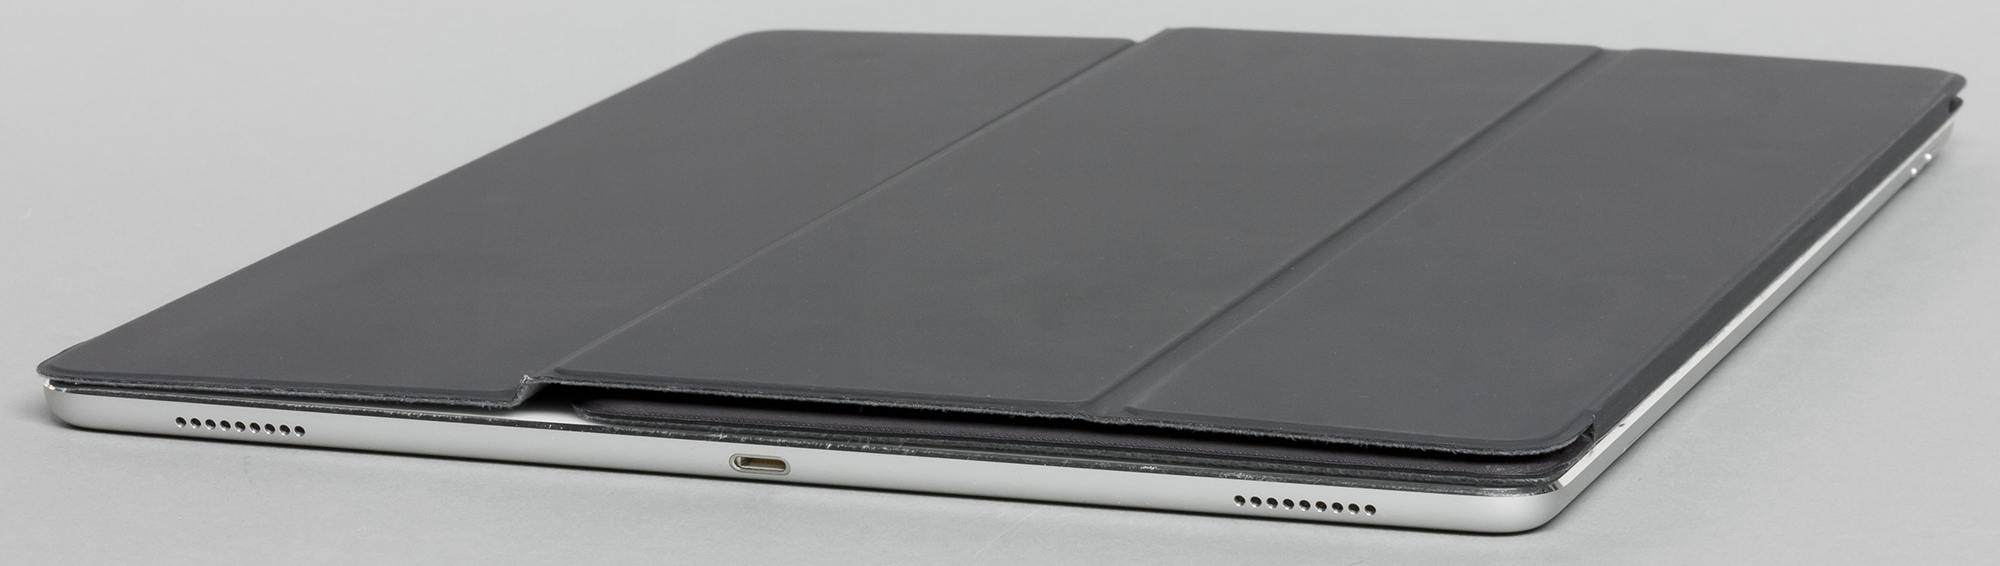 secure folder pro для айпад инструкция